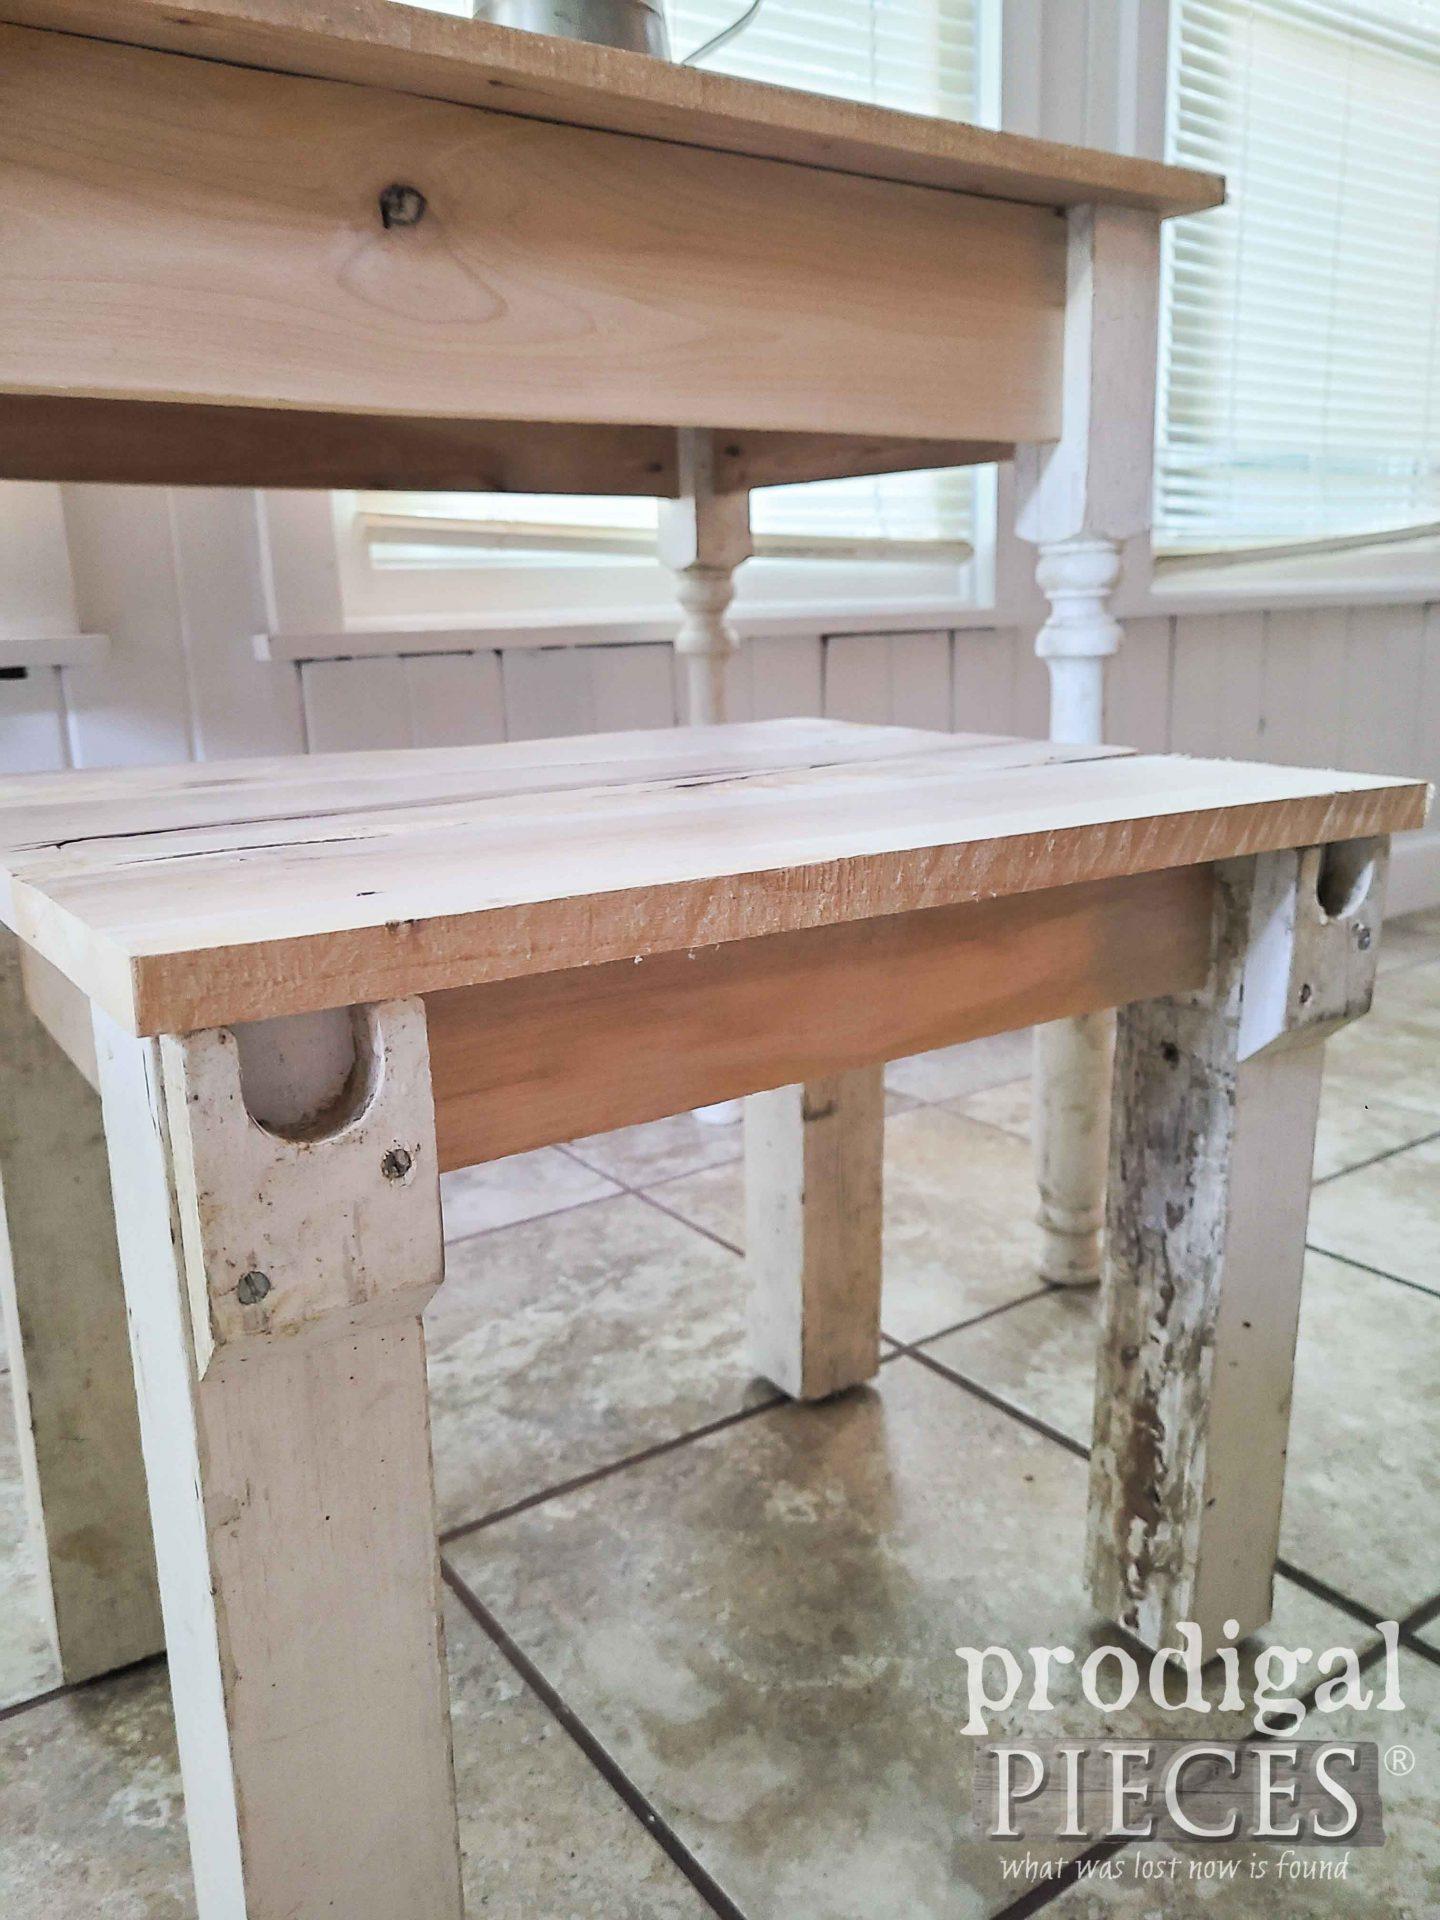 Reclaimed Desk Set Seat by Larissa of Prodigal Pieces | prodigalpieces.com #prodigalpieces #reclaimed #home #homedecor